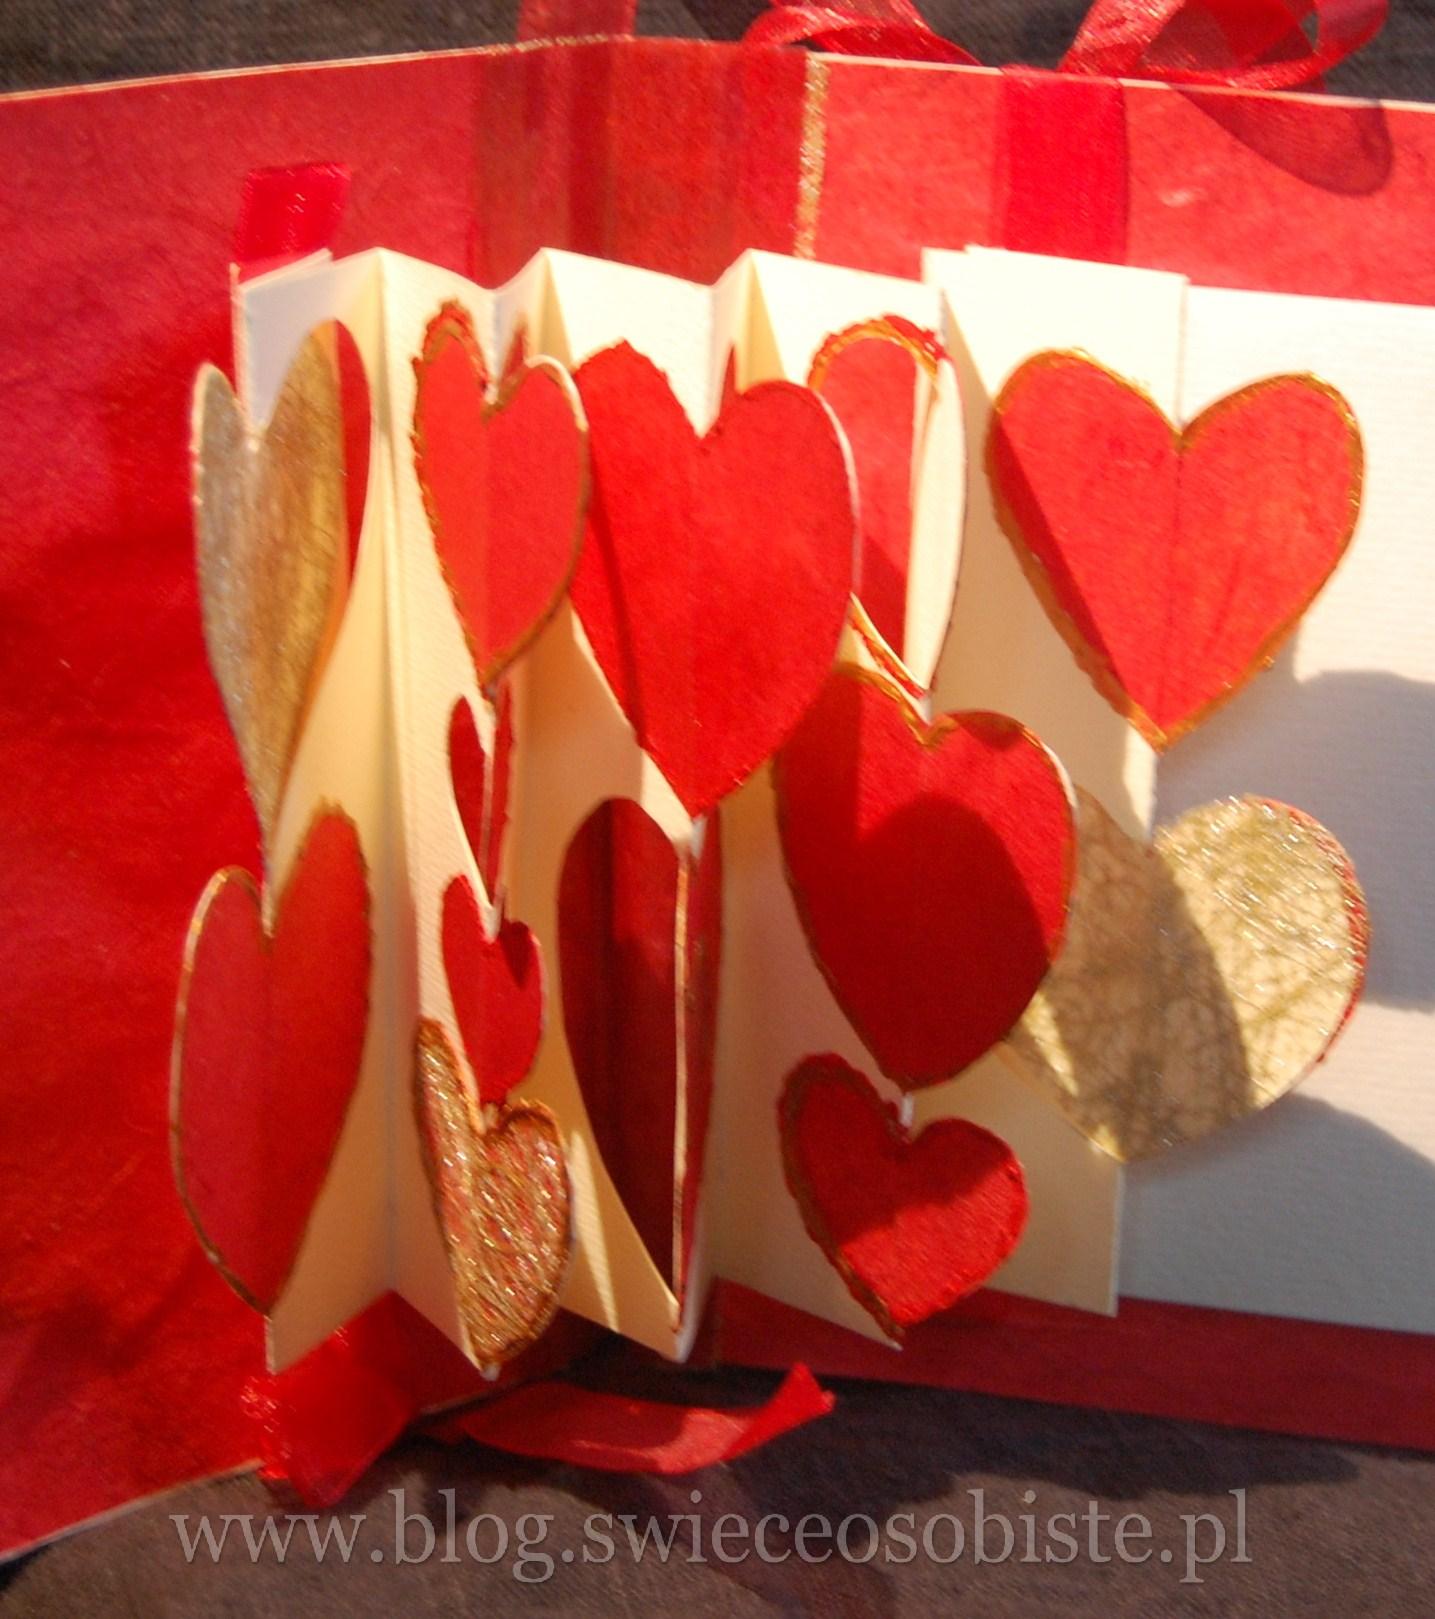 Code valentine 01 - 3 9